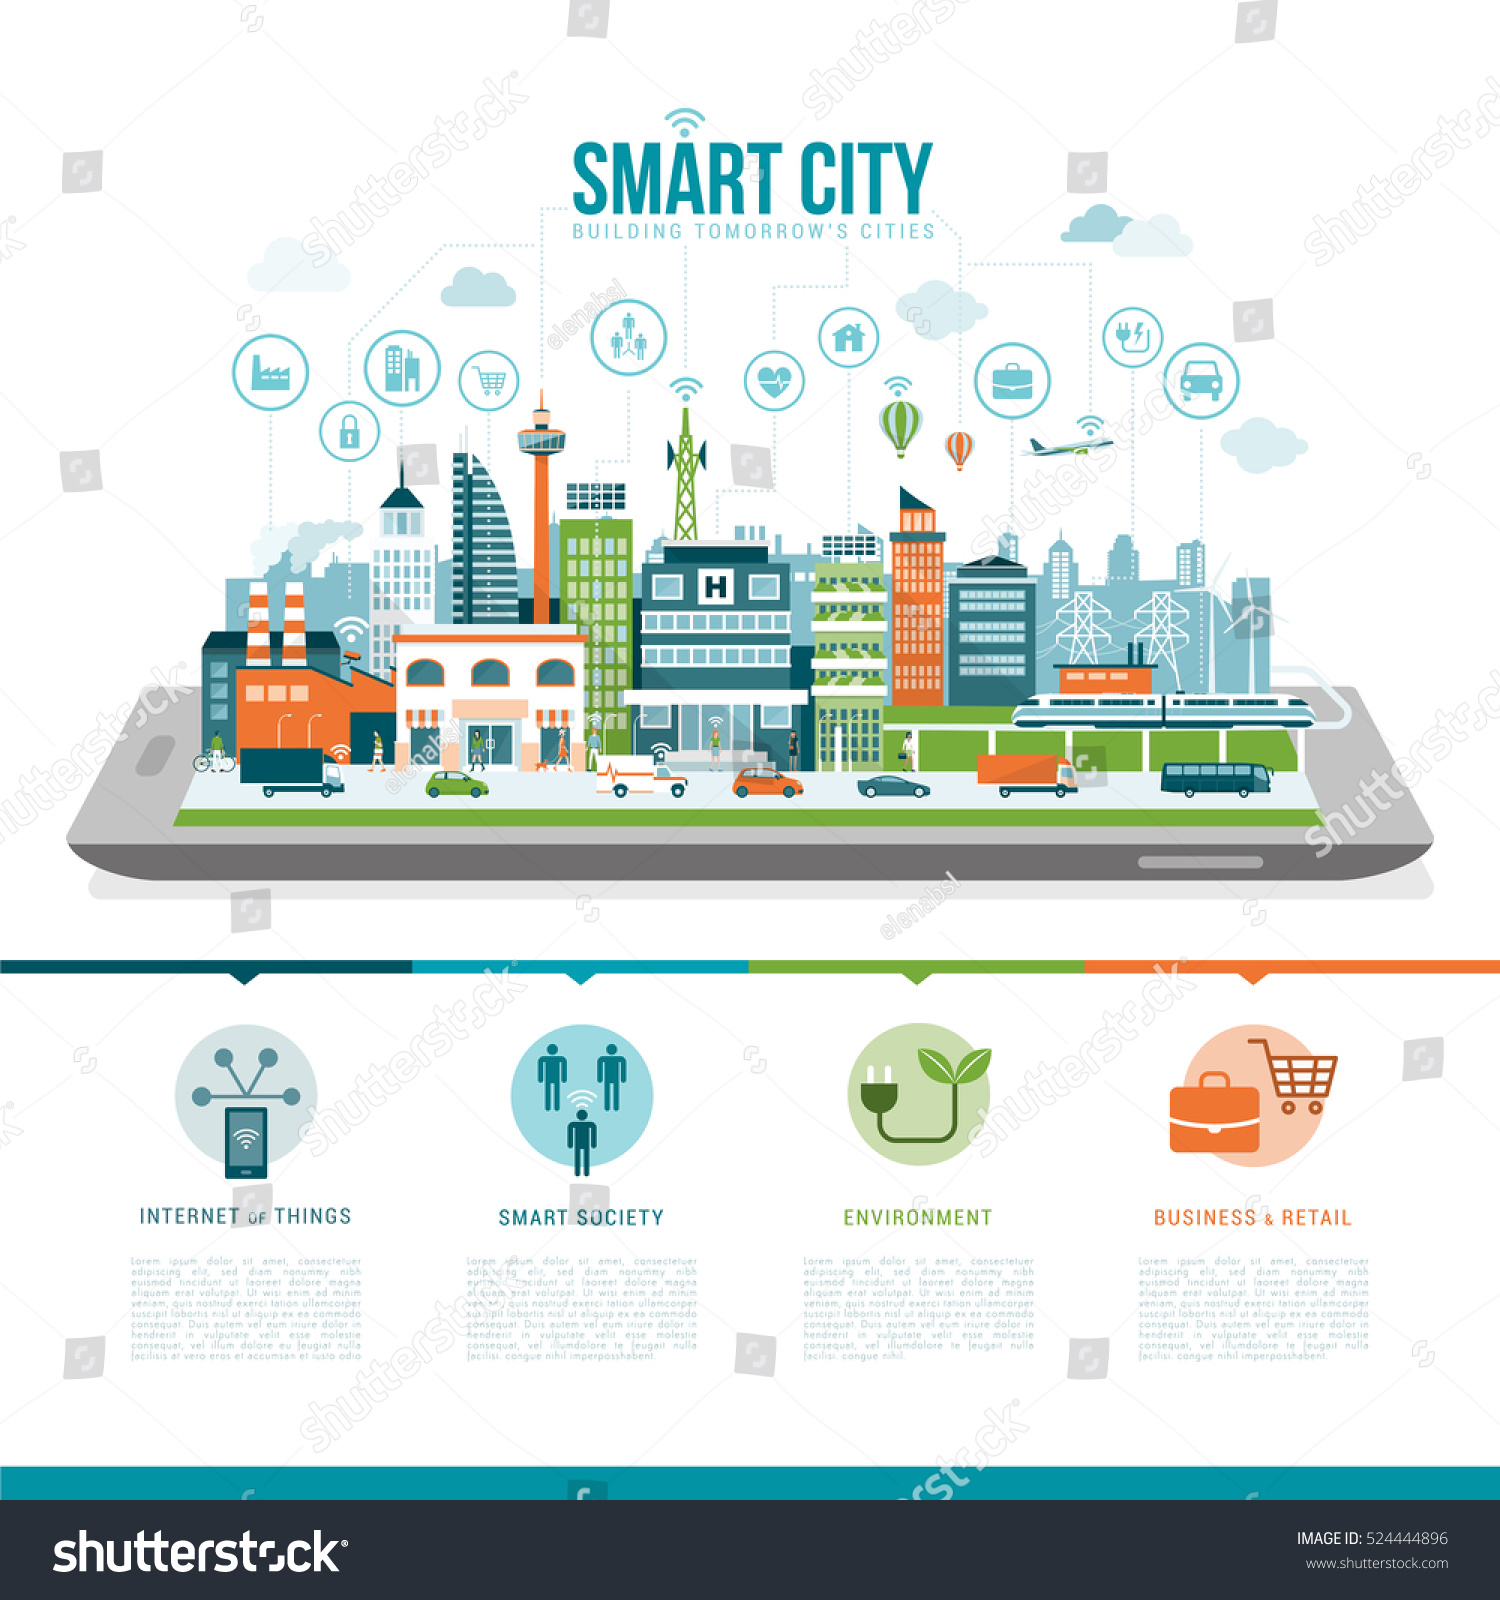 Smart City On Digital Tablet Smartphone Stock Vector ...